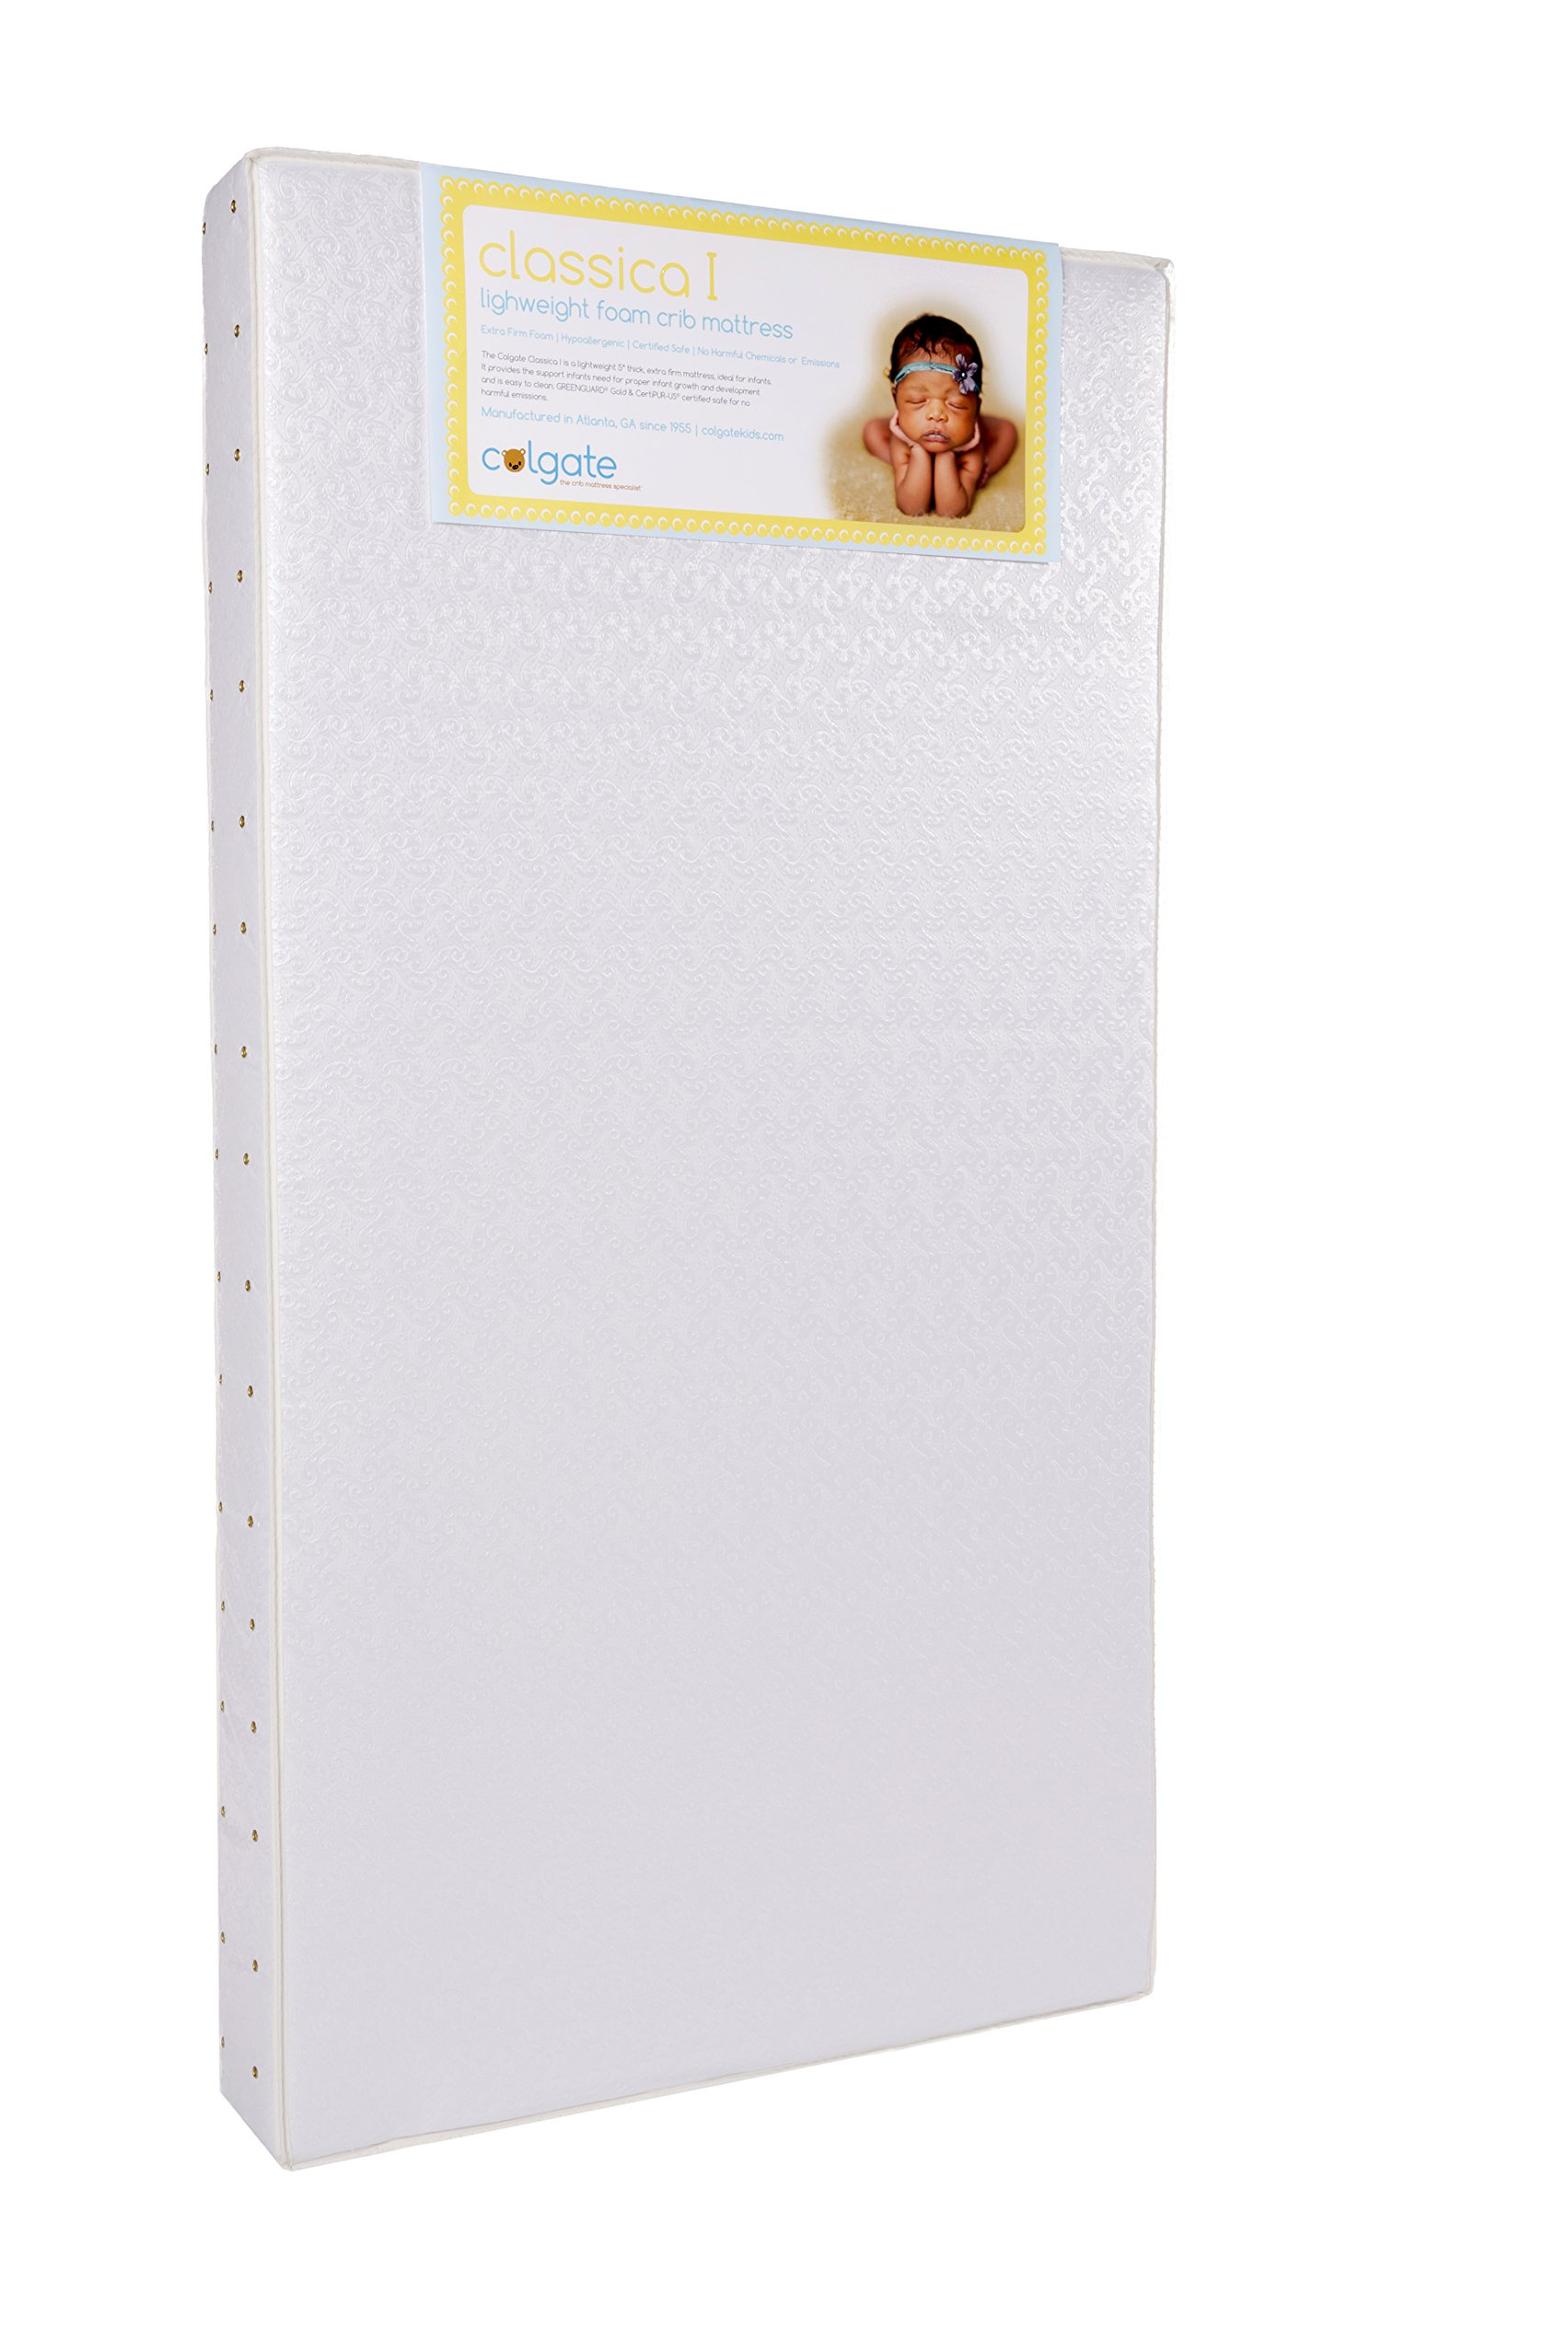 Colgate Classica I - Lightweight Foam Crib Mattress with Waterproof Cover, White